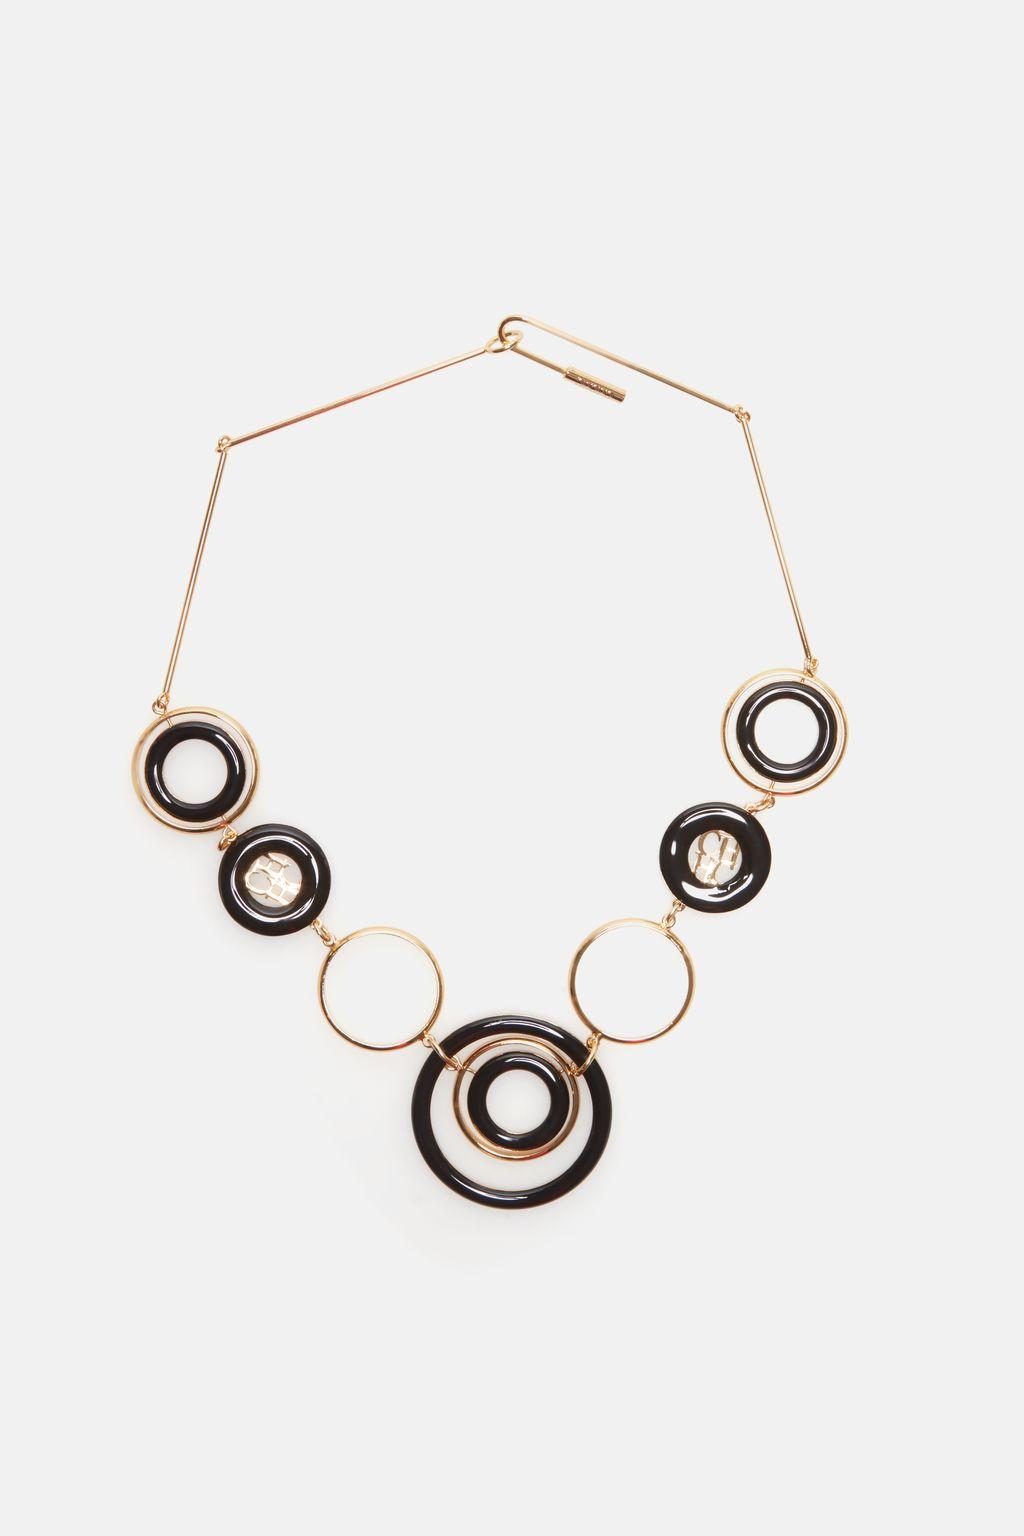 Copérnico necklace